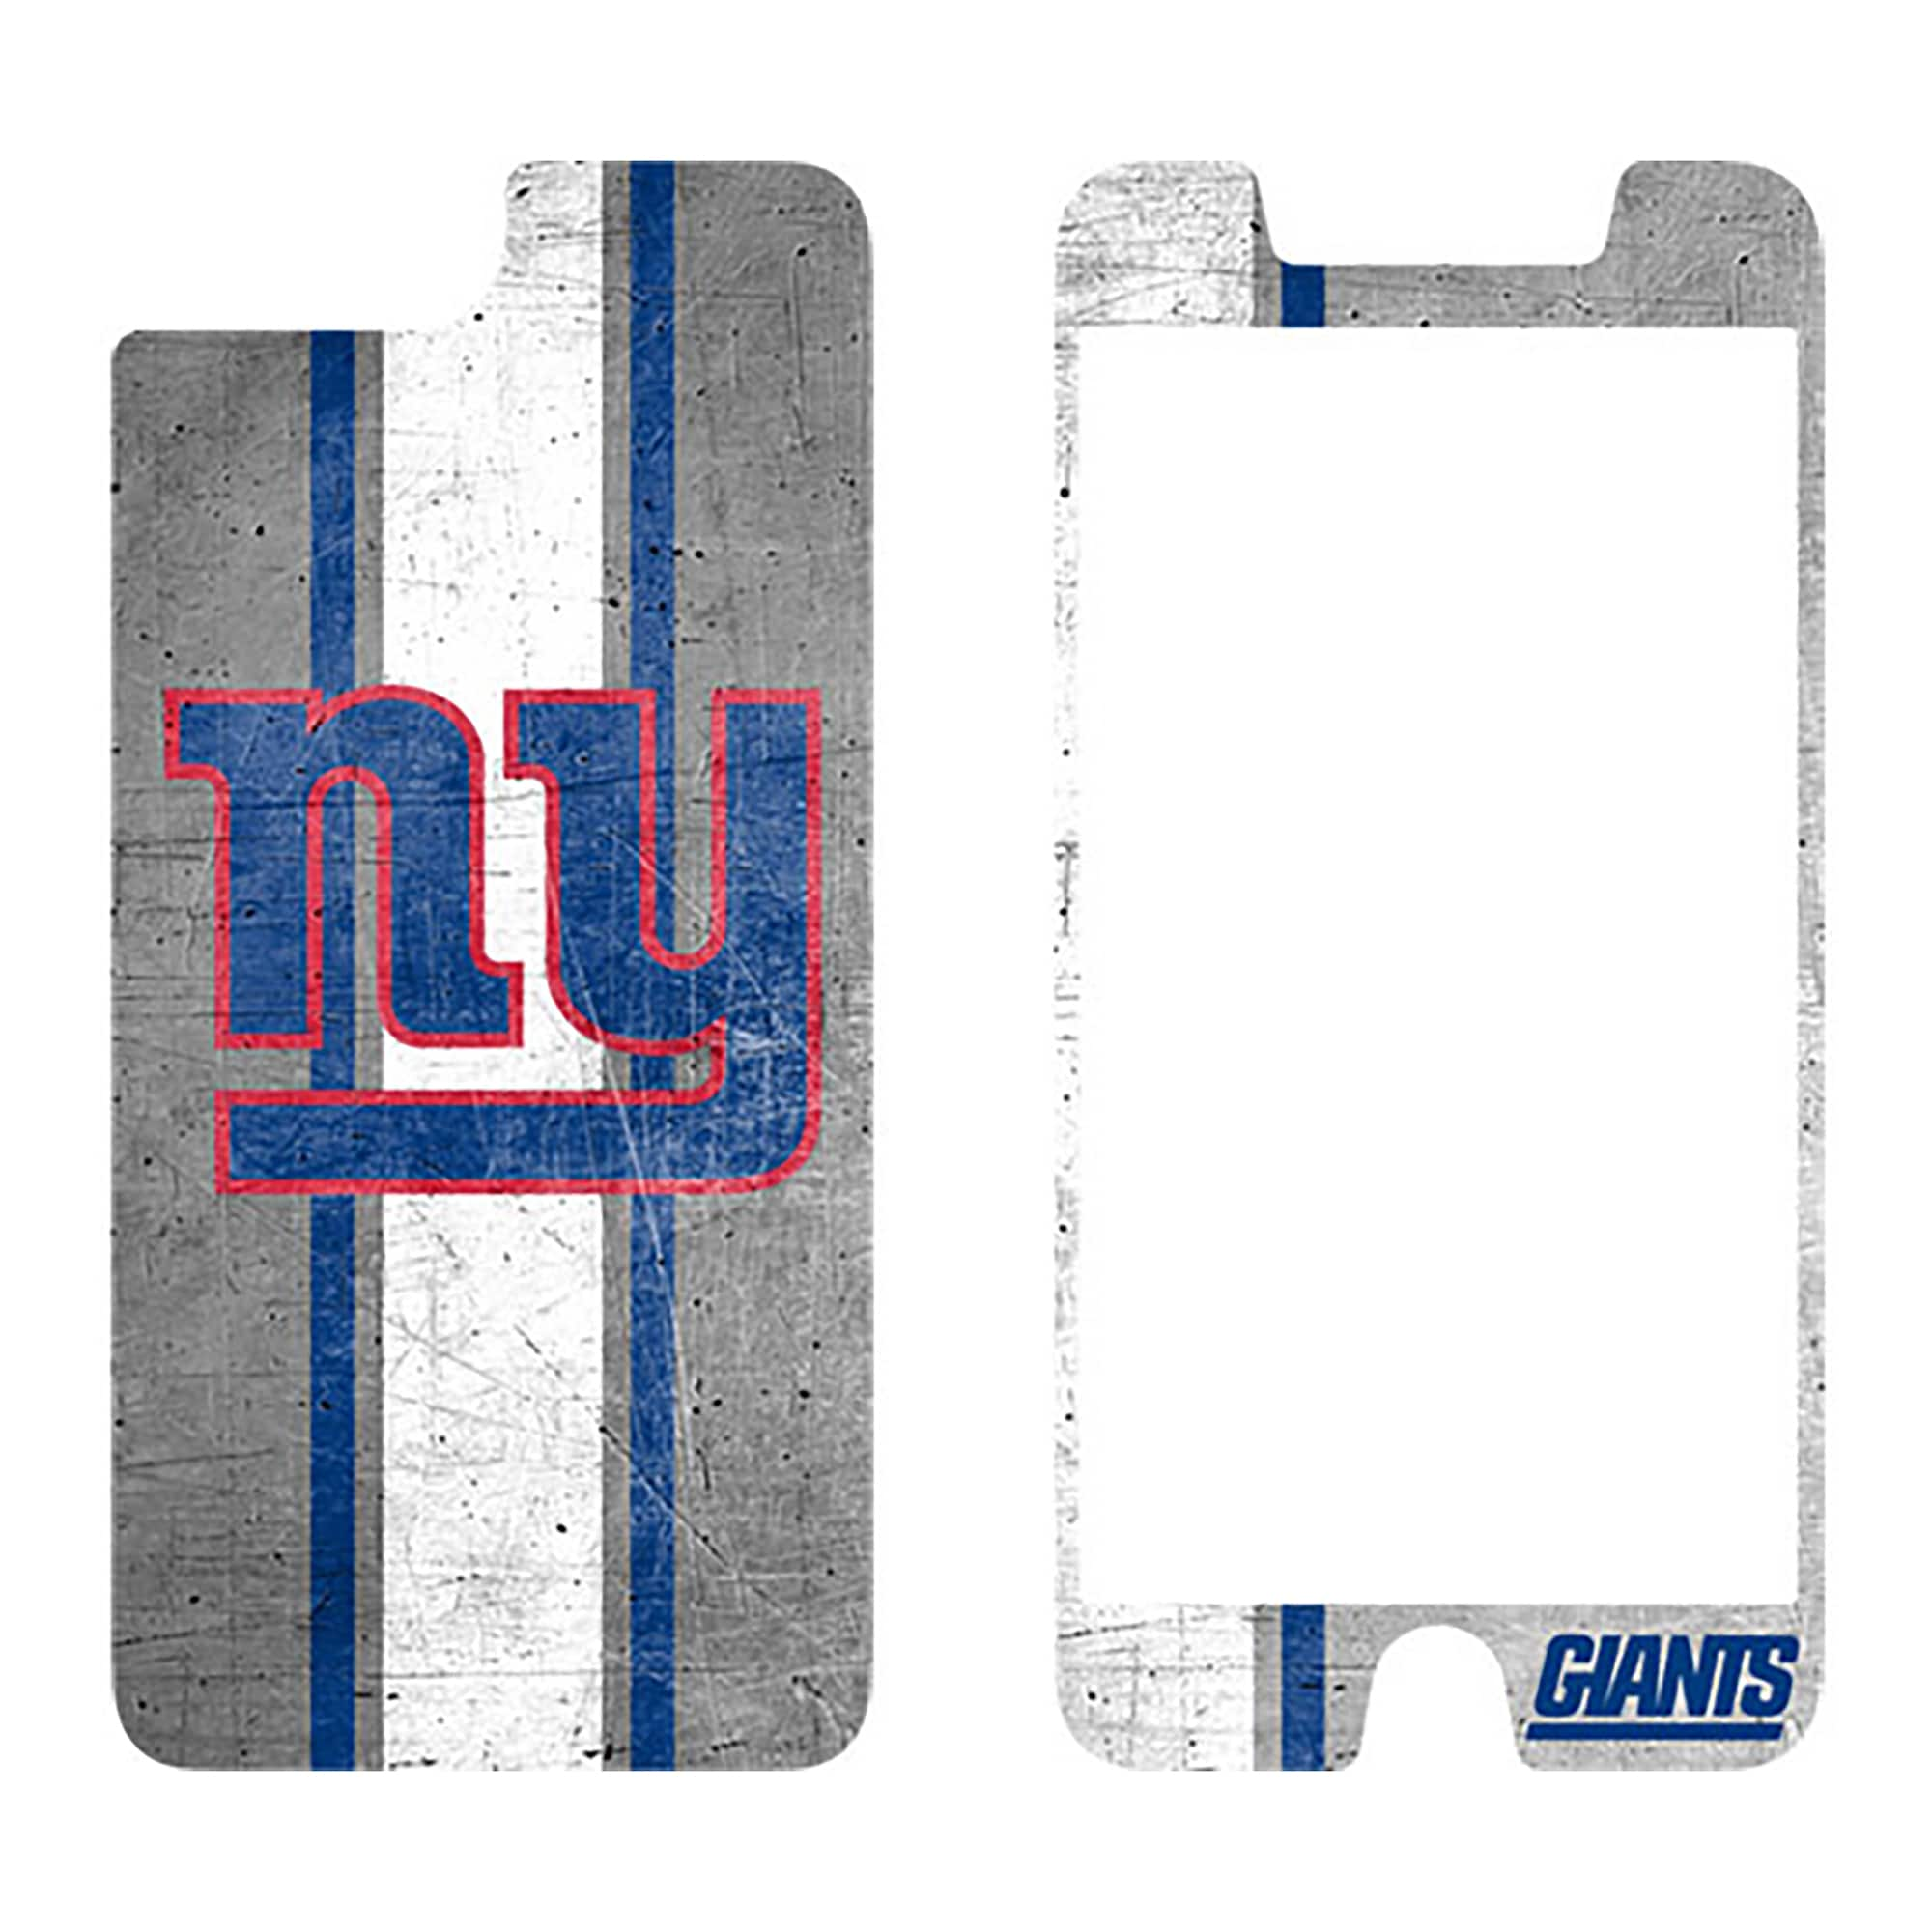 New York Giants OtterBox iPhone 8 Plus/7 Plus/6 Plus/6s Plus Alpha Glass Screen Protector